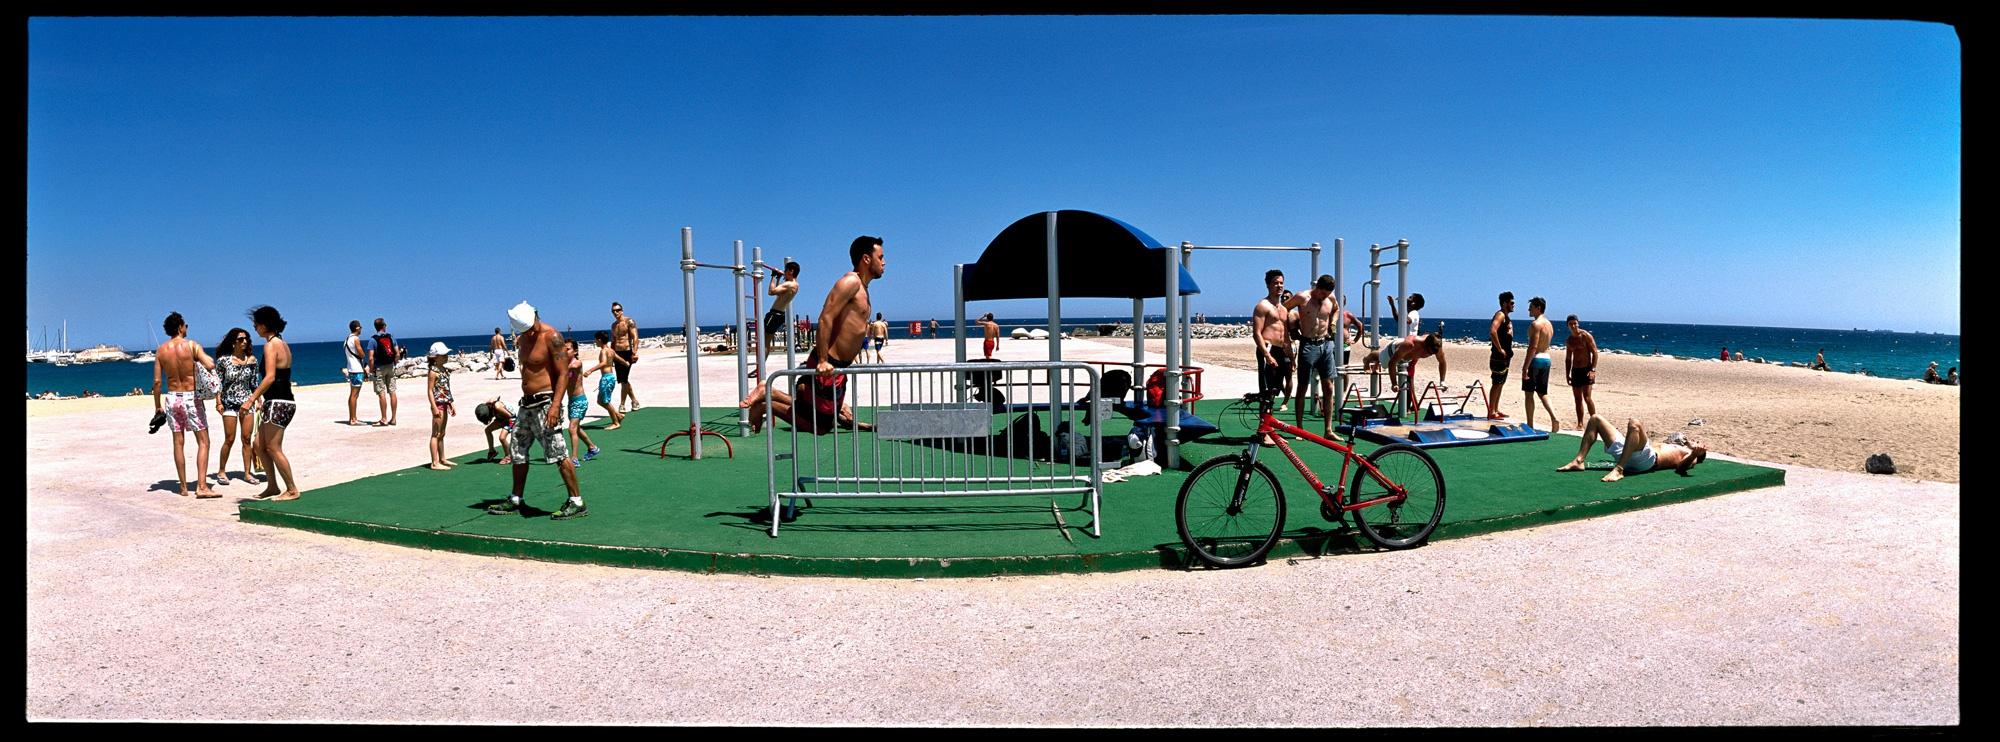 Fitnessplatz Barcelona Strand